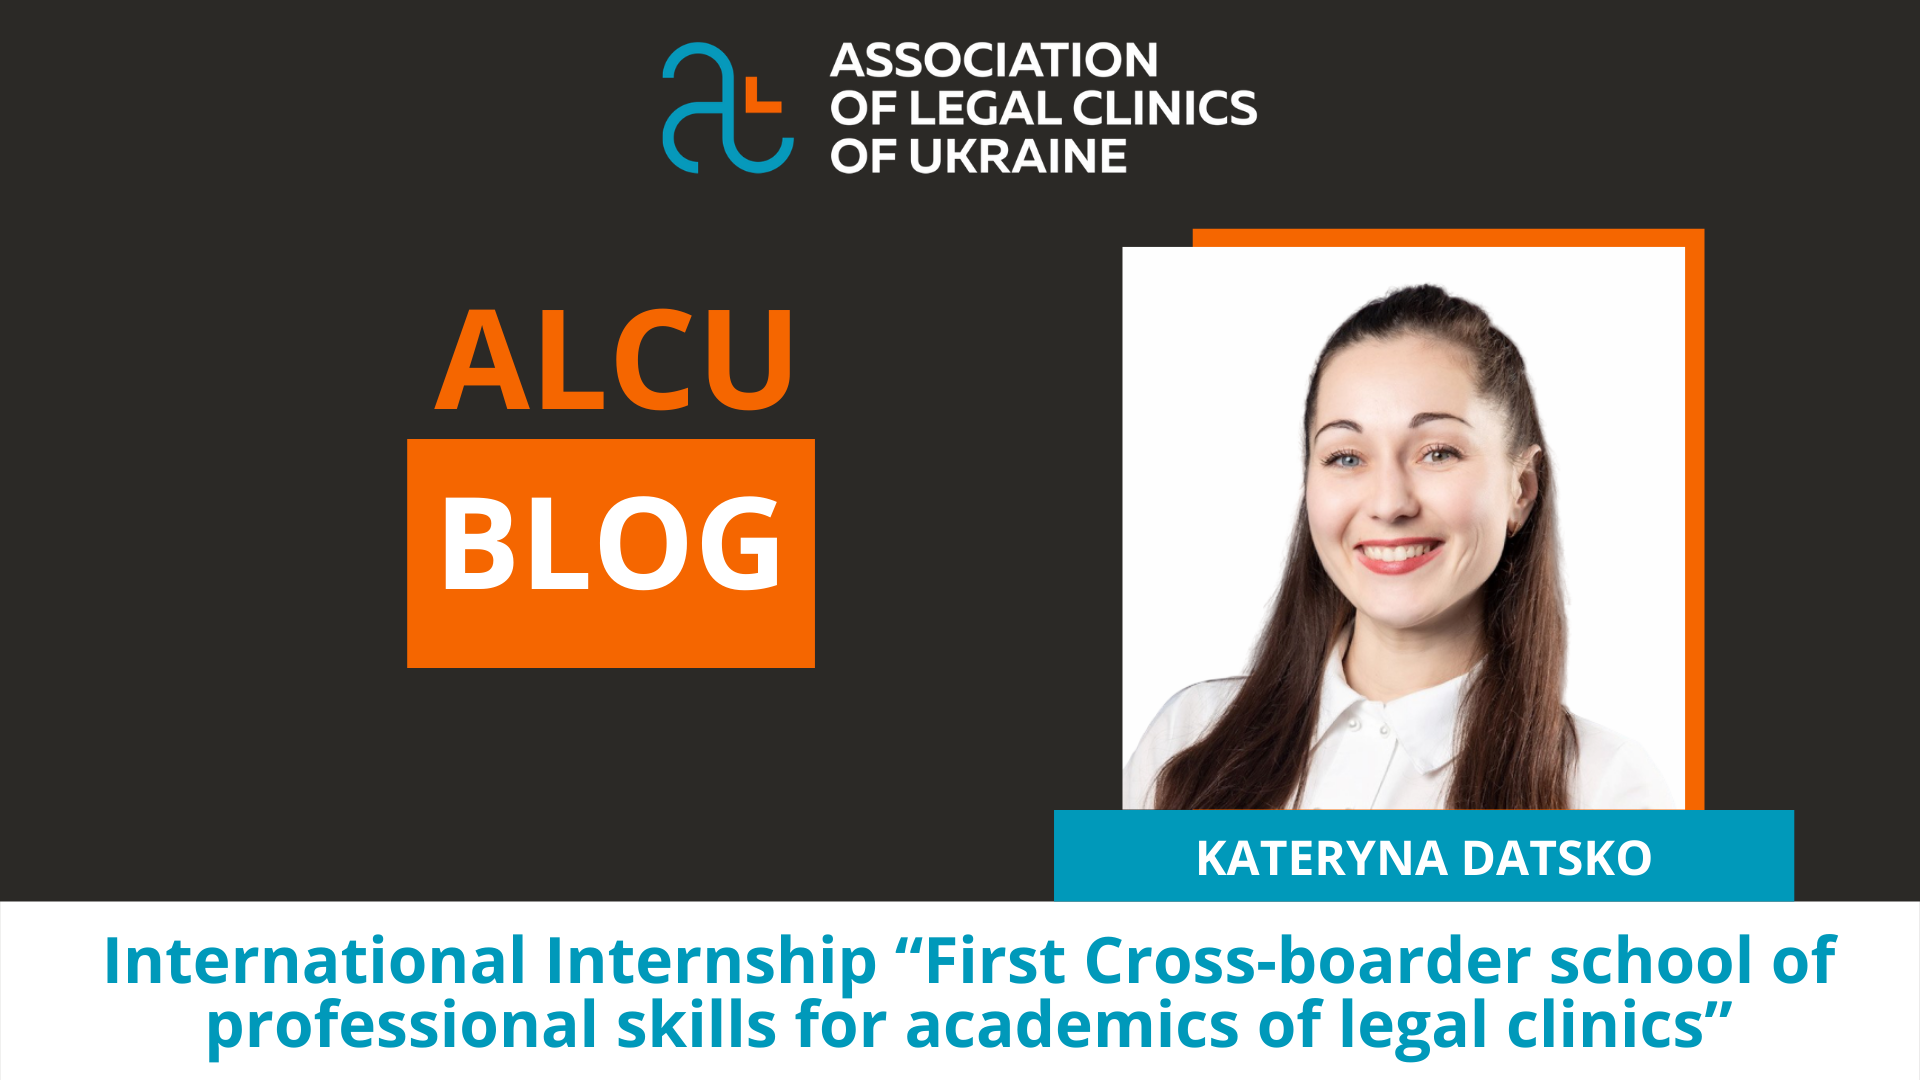 International Internship: First Cross-border School of Professional Skills for Academics of Legal Clinics